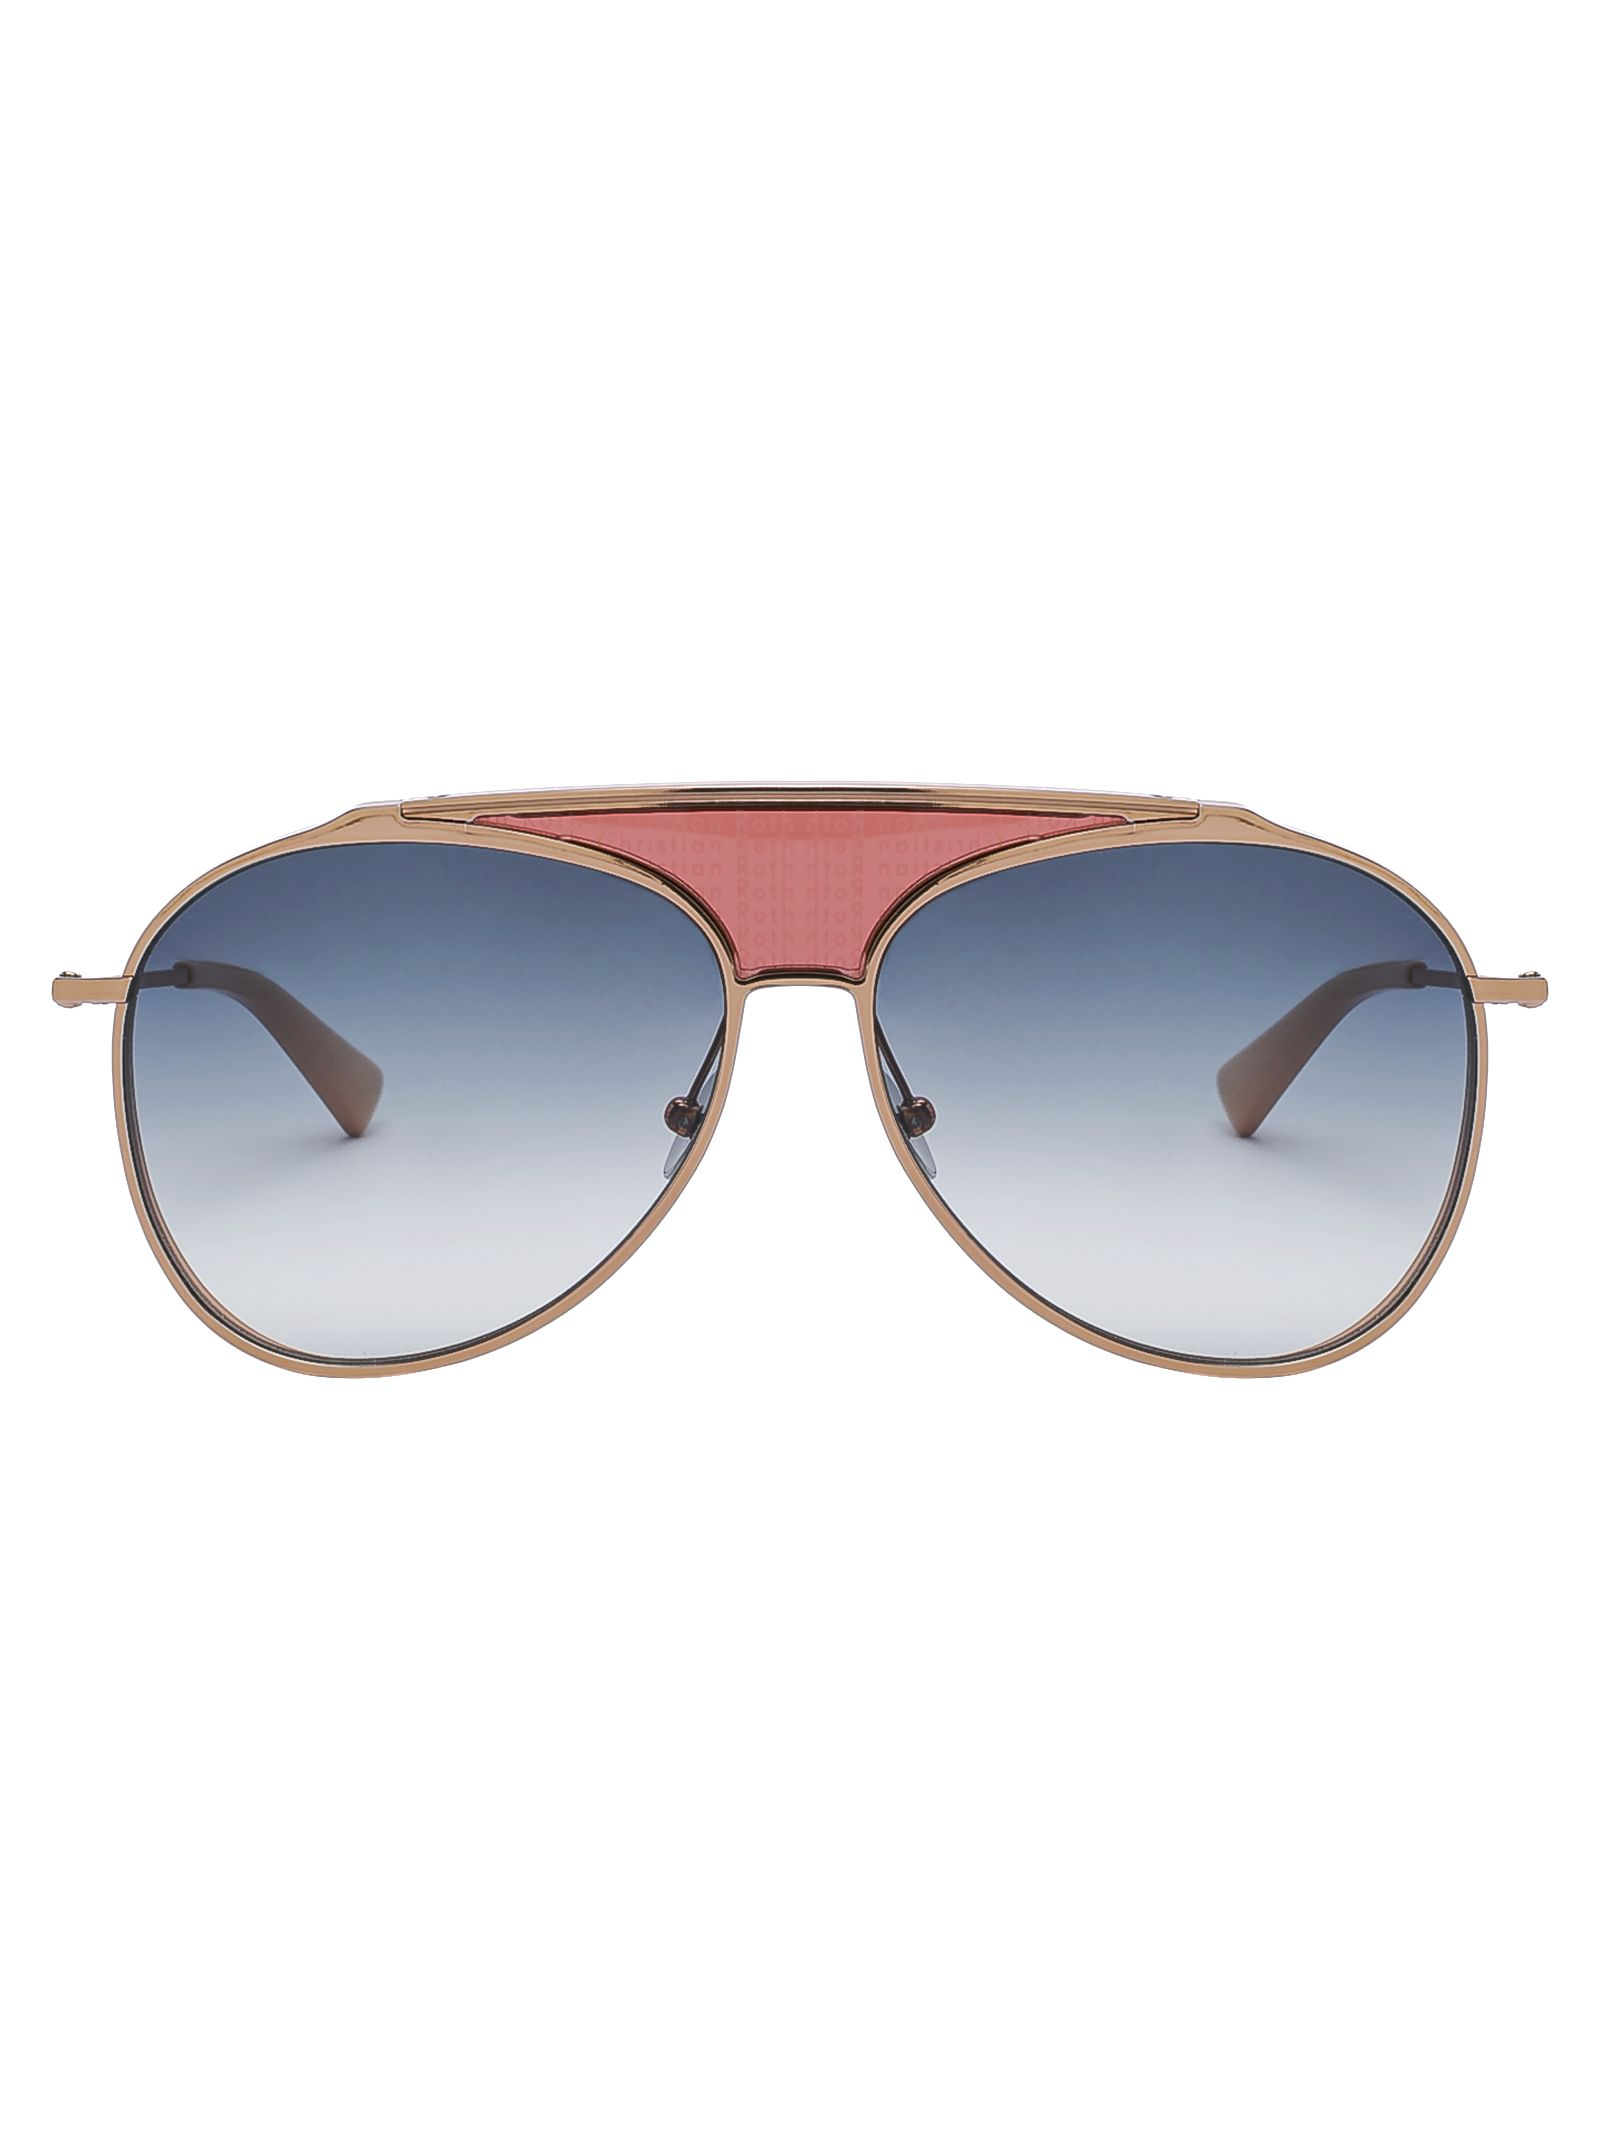 Christian sol gafas rosa en Roth de Funker oro rc07IOrq68